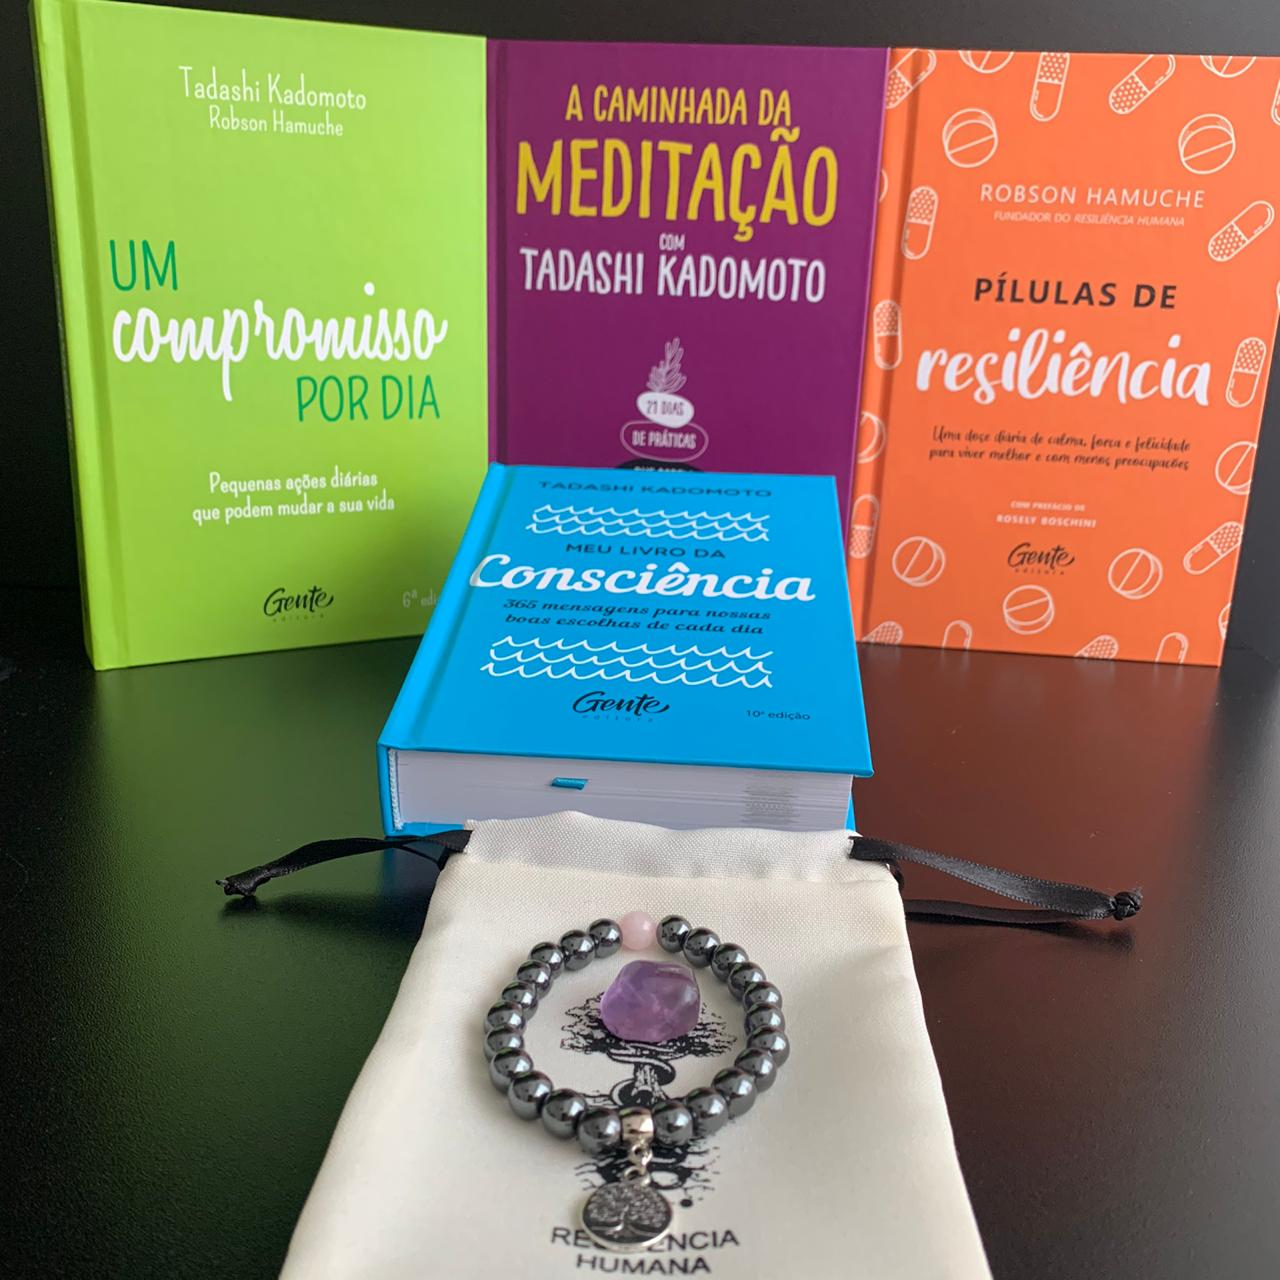 KIT 4  PROPÓSITO - CONTÉM:  4 Livros + 1 Pulseira de Hematita com Quartzo Rosa + Pedra Ametista